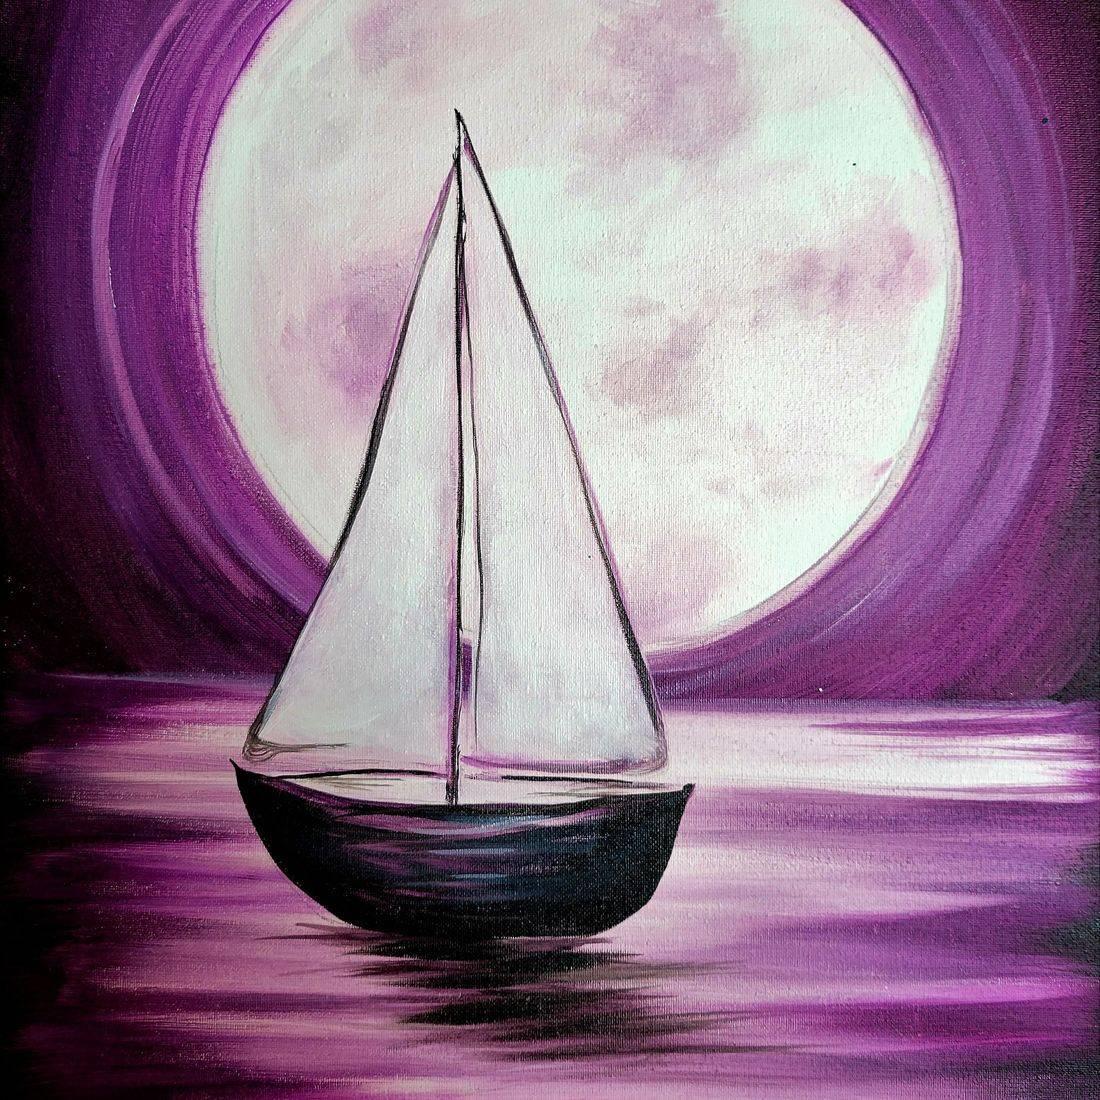 Moonlight Cruise